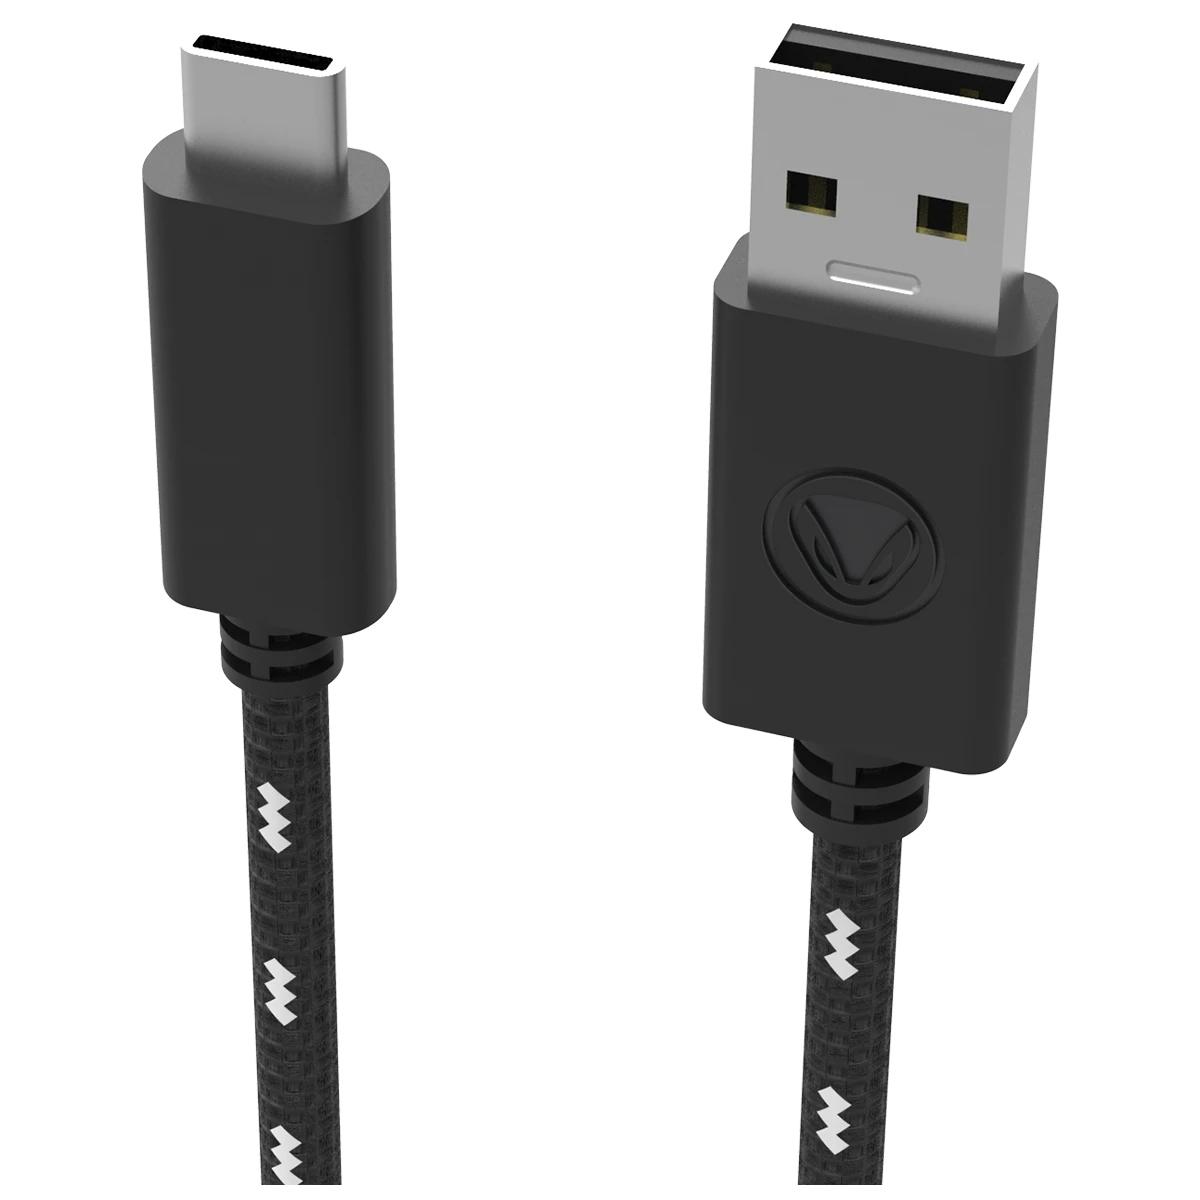 SnakeByte SONY PS5 USBケーブル CHARGE:CABLE 5™(3M)チャージ:ケーブル 5 最新ゲーム機対応のUSBケーブル